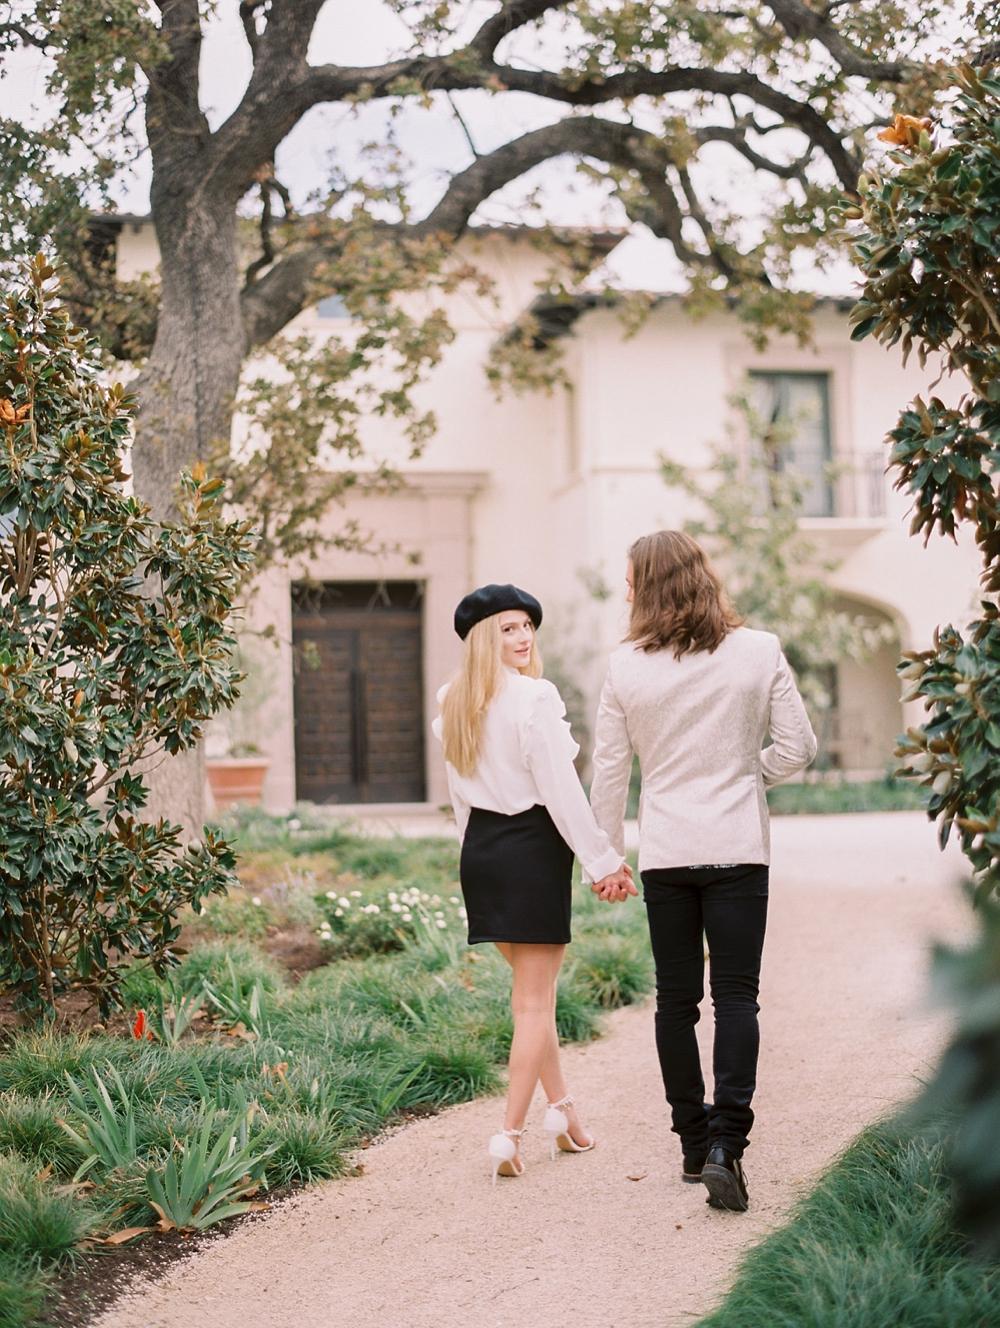 kristin-la-voie-photography-Austin-Wedding-Boudoir-Photographer-Commodore-Perry-Estate-135